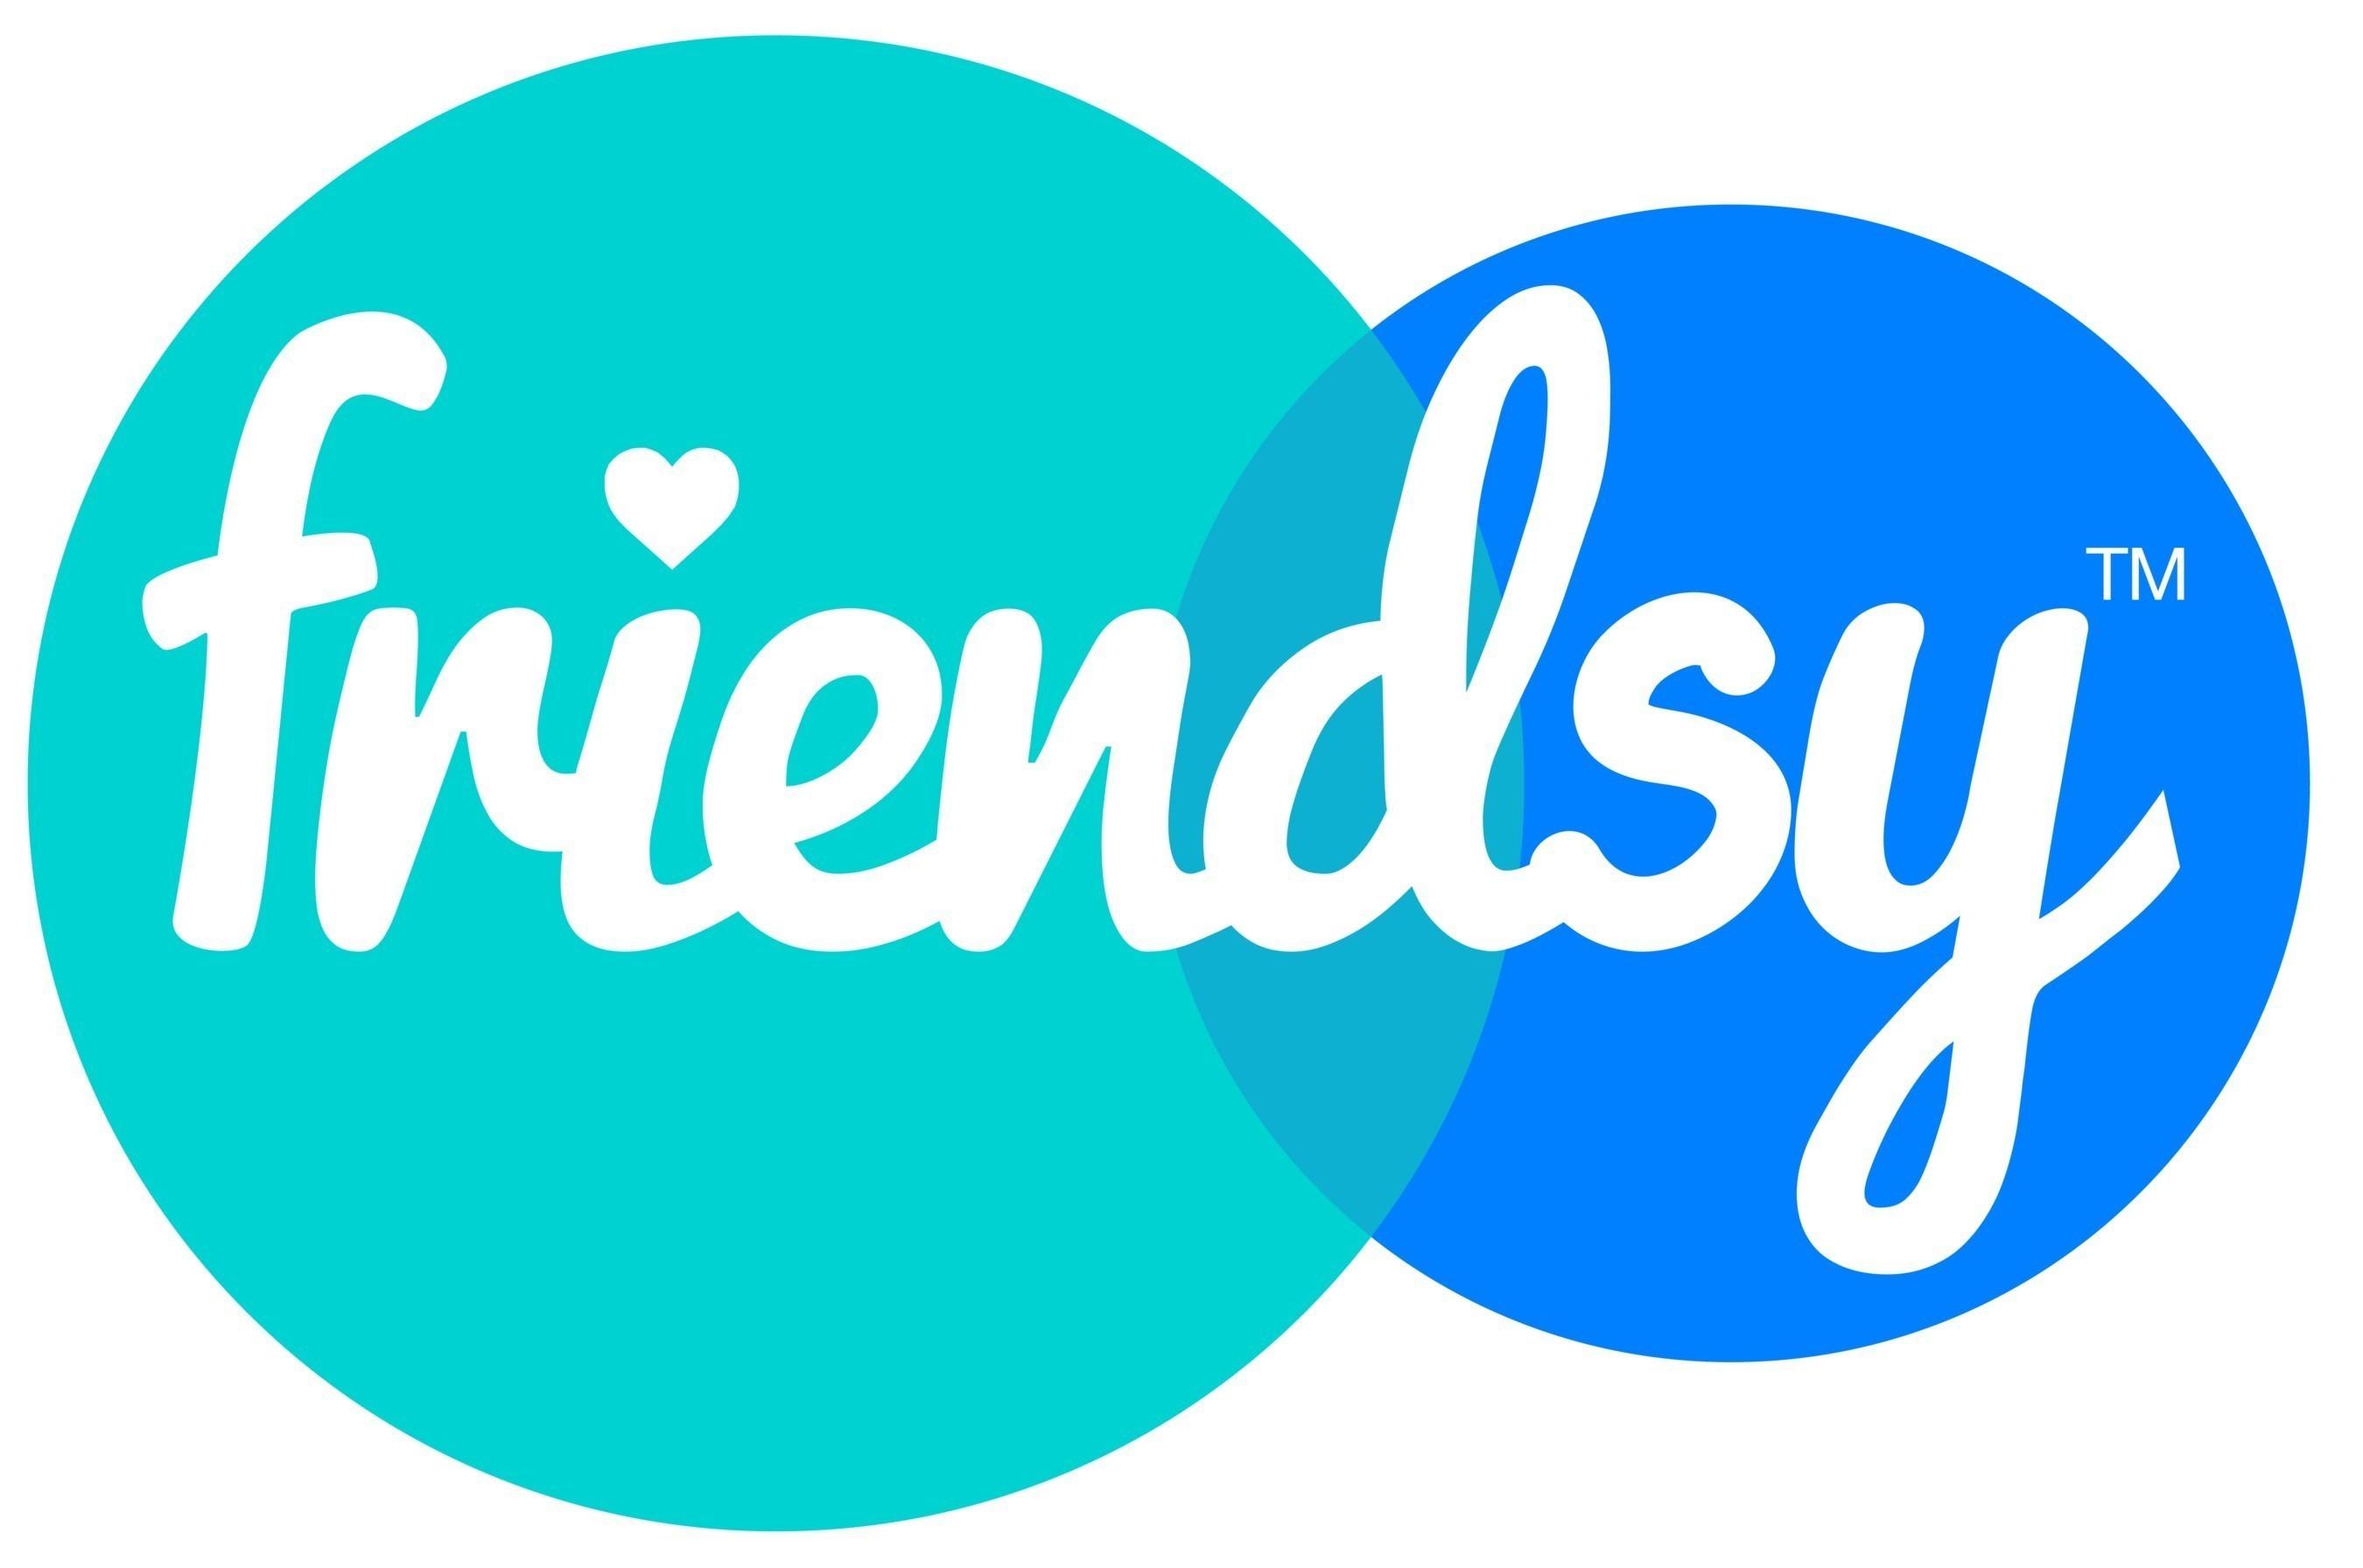 Princeton University's Friendsy Lands $500K from Lerer Hippeau Ventures and Slow Ventures